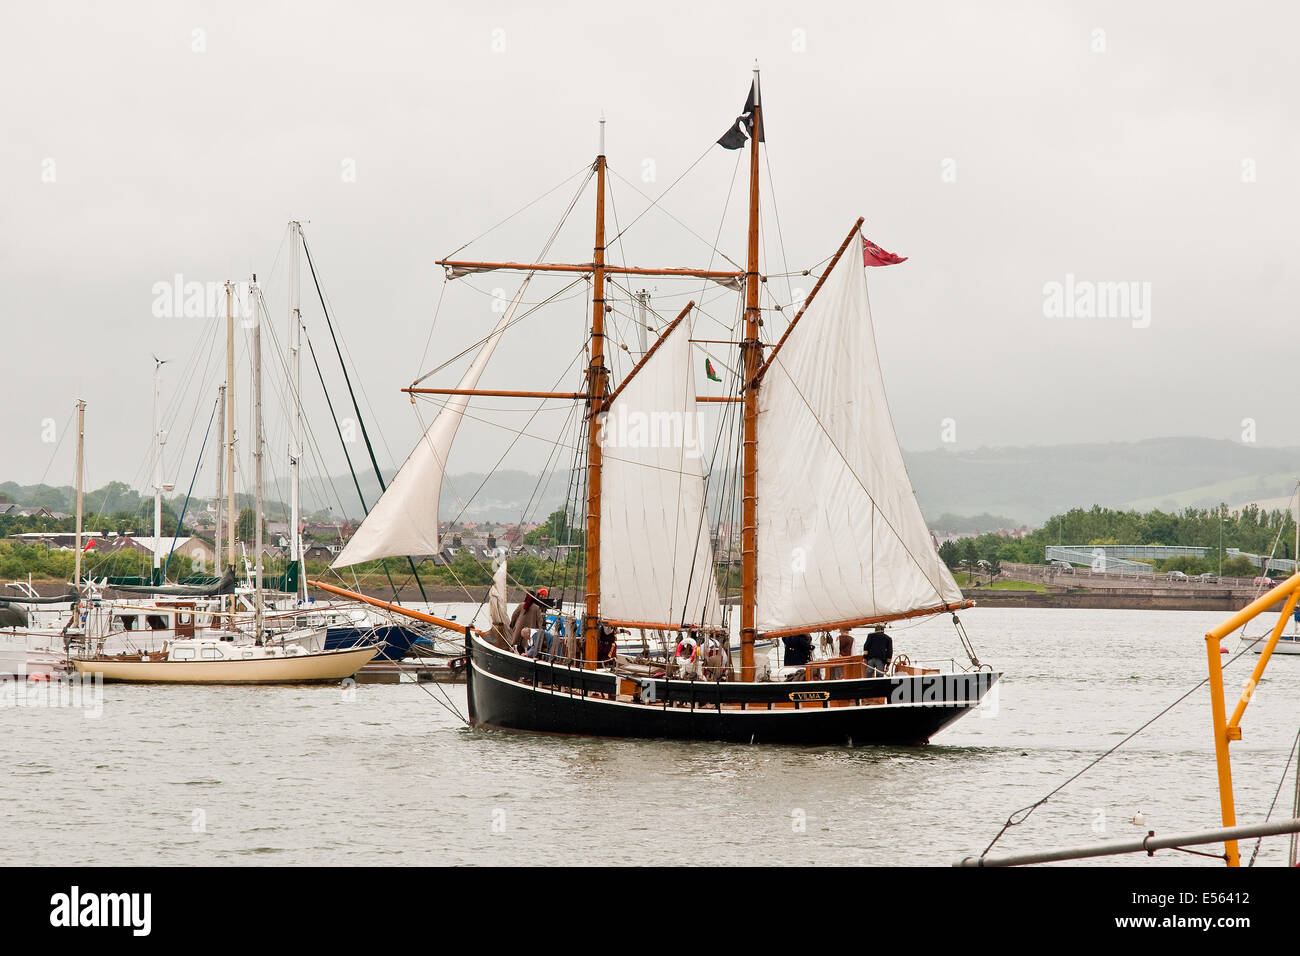 A Pirate Schooner Ship Stock Photos & A Pirate Schooner Ship Stock